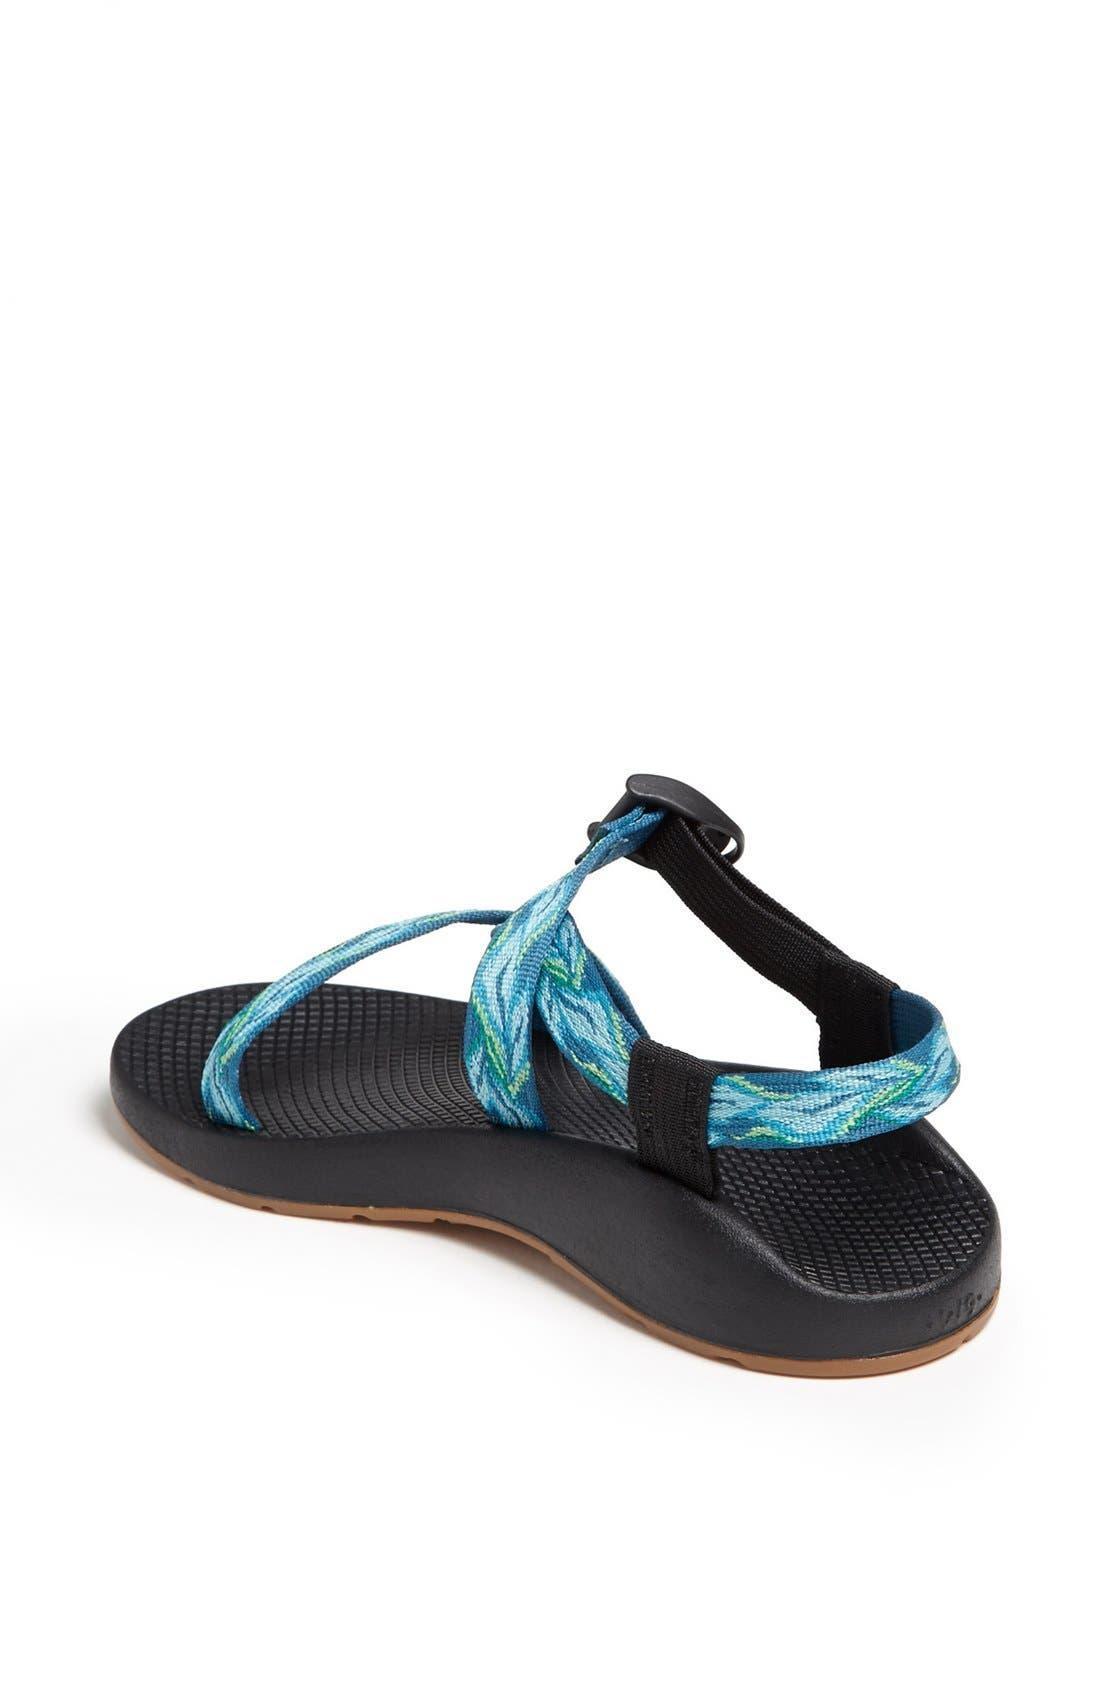 Alternate Image 2  - Chaco 'Z1 Yampa' Sandal